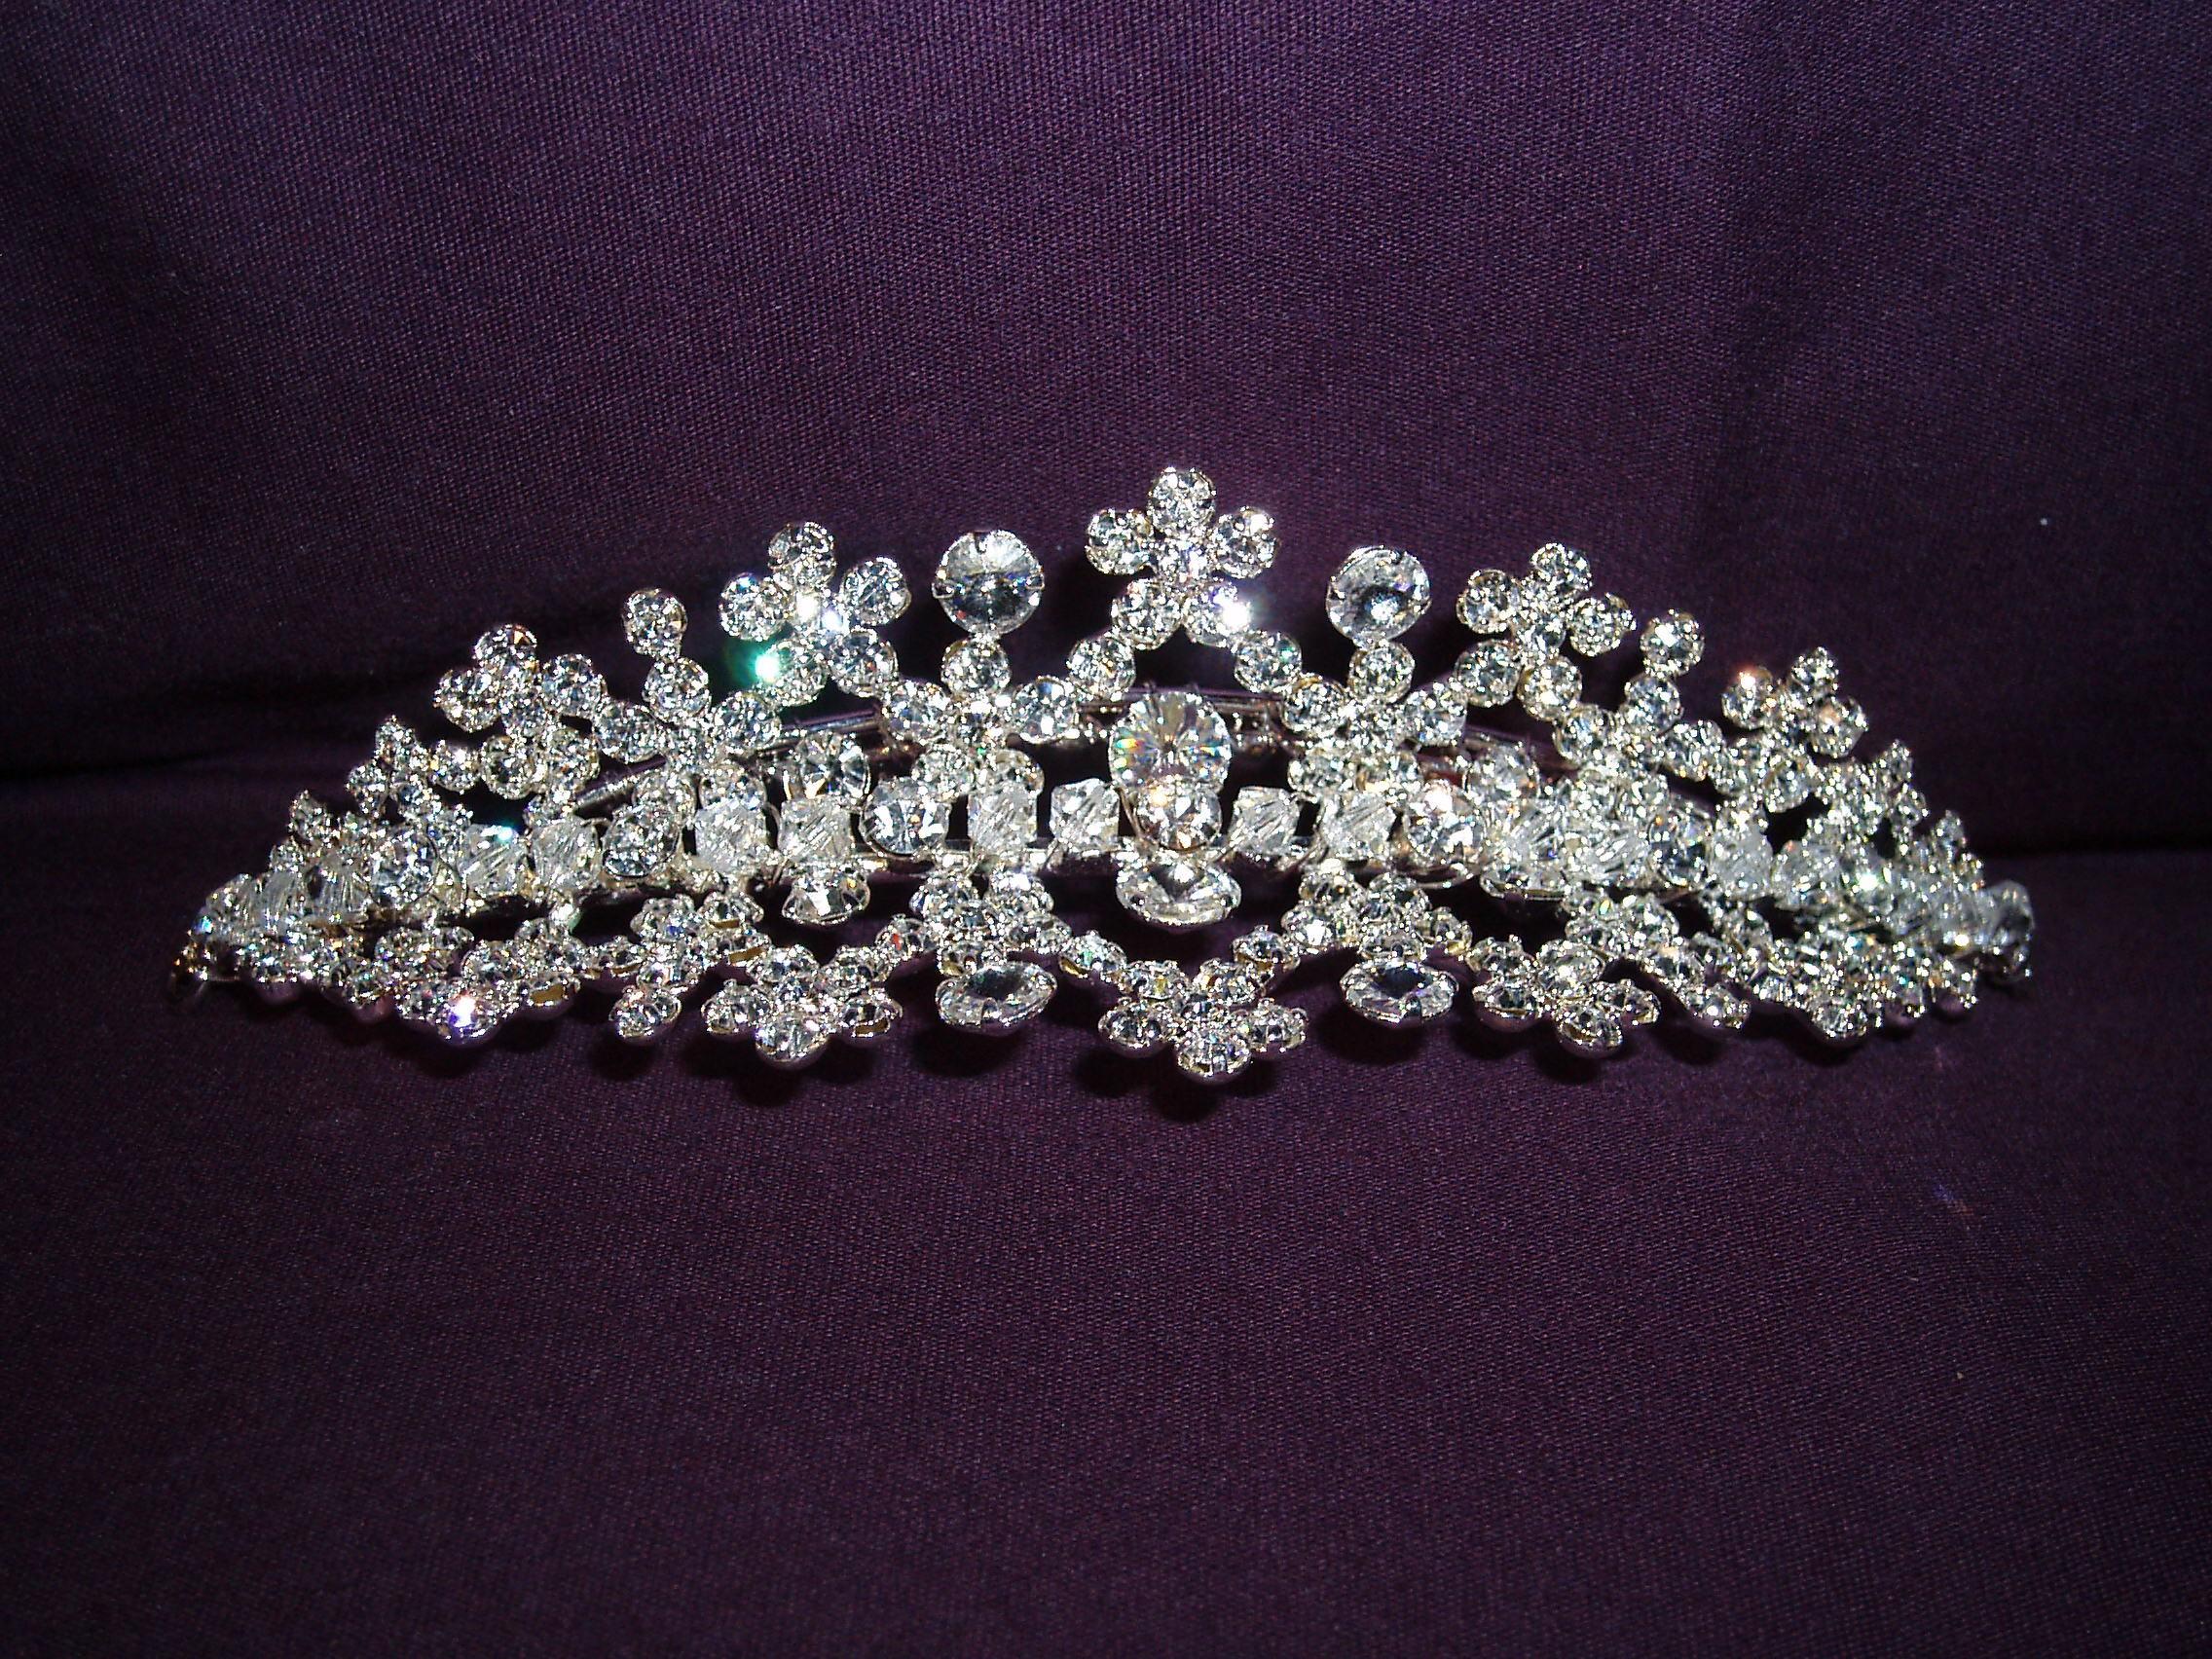 Beauty, Jewelry, Tiaras, Comb, Hair, Tiara